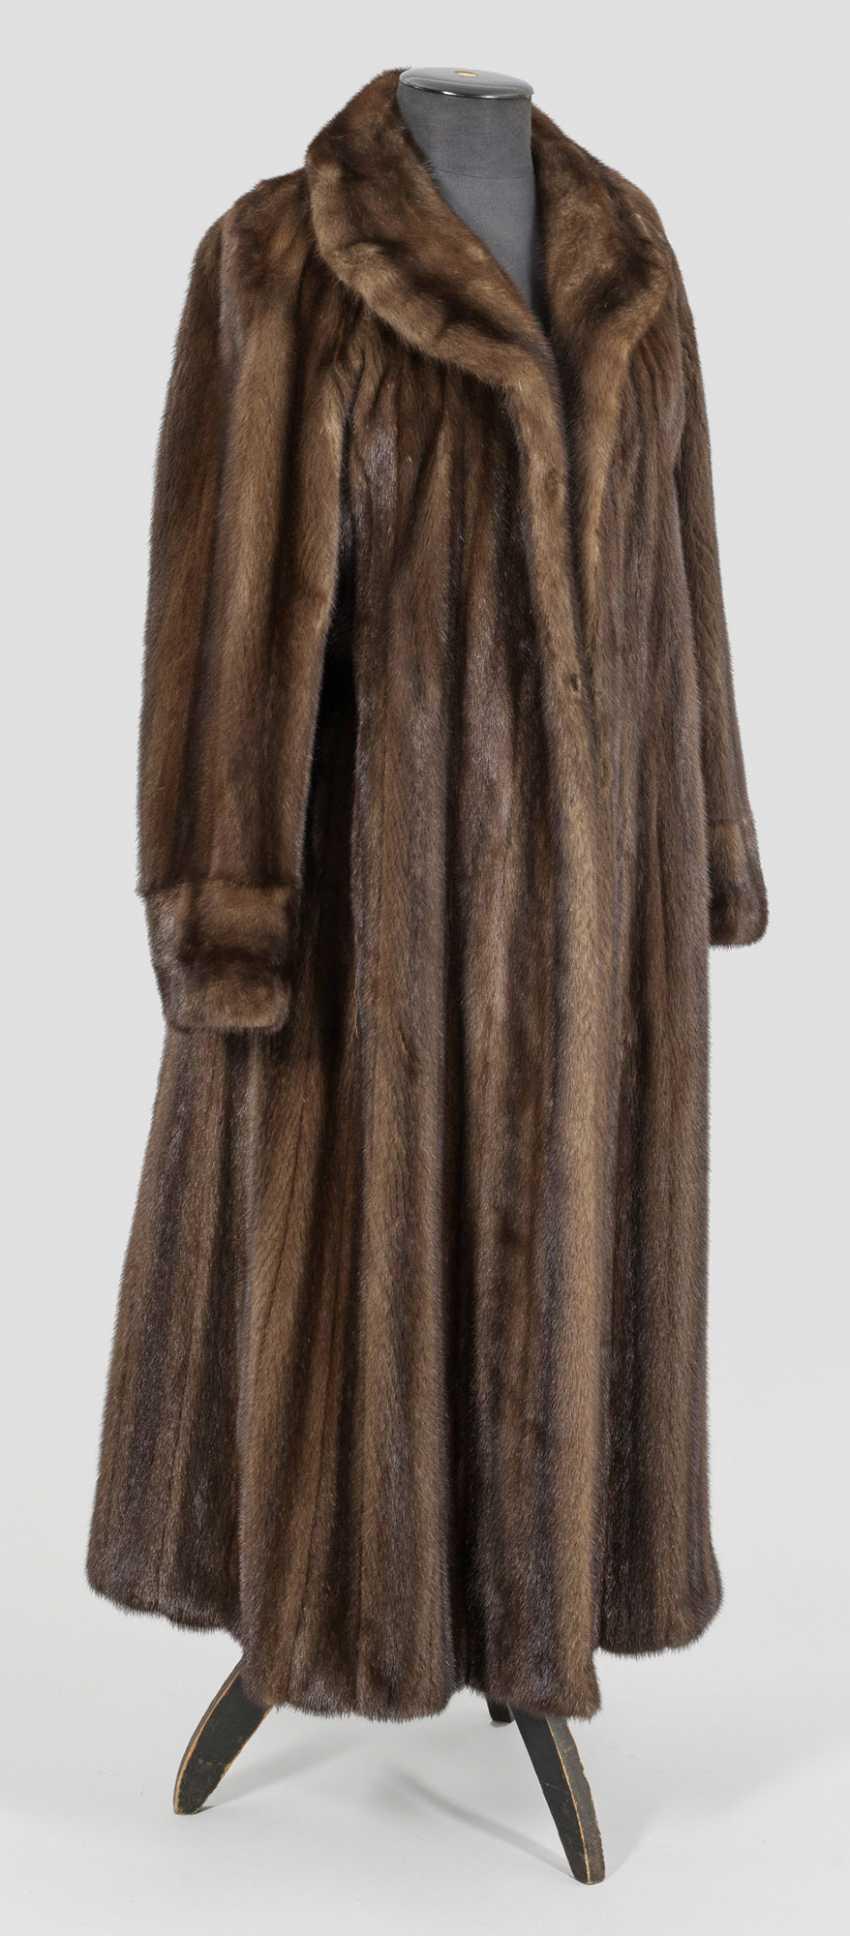 Винтаж женская норковая шуба от Валентино - фото 1